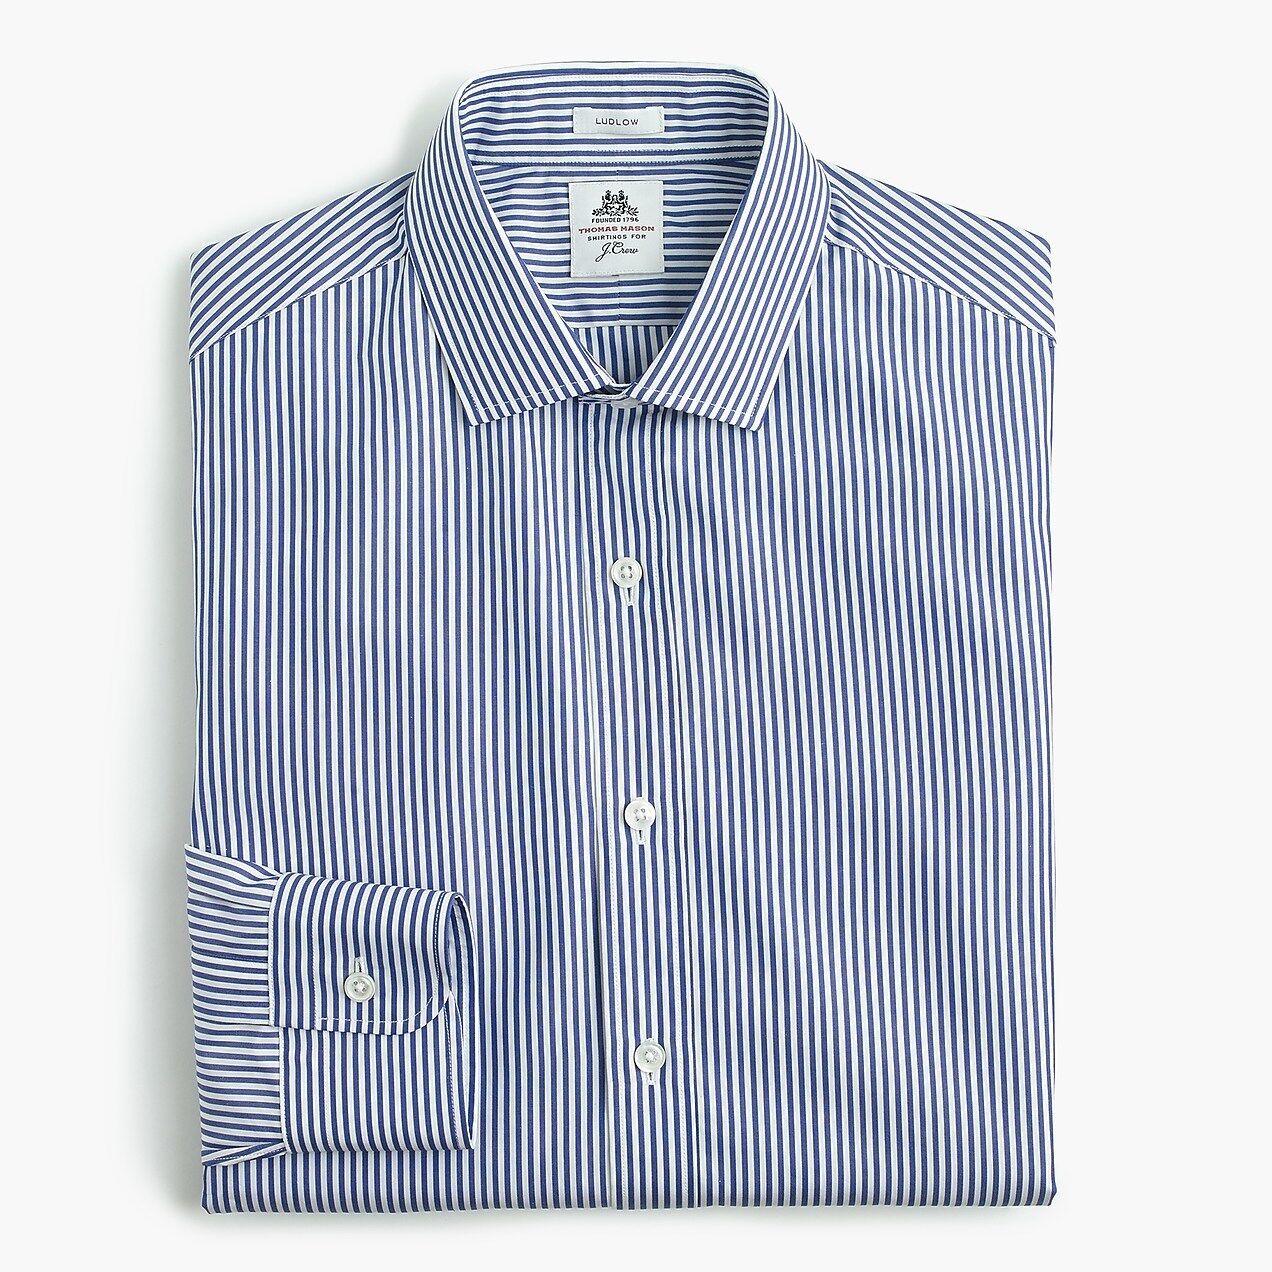 Thomas Mason for J.Crew Ludlow Men's Slim-fit Shirt in Blau Stripe 168 NEW XL